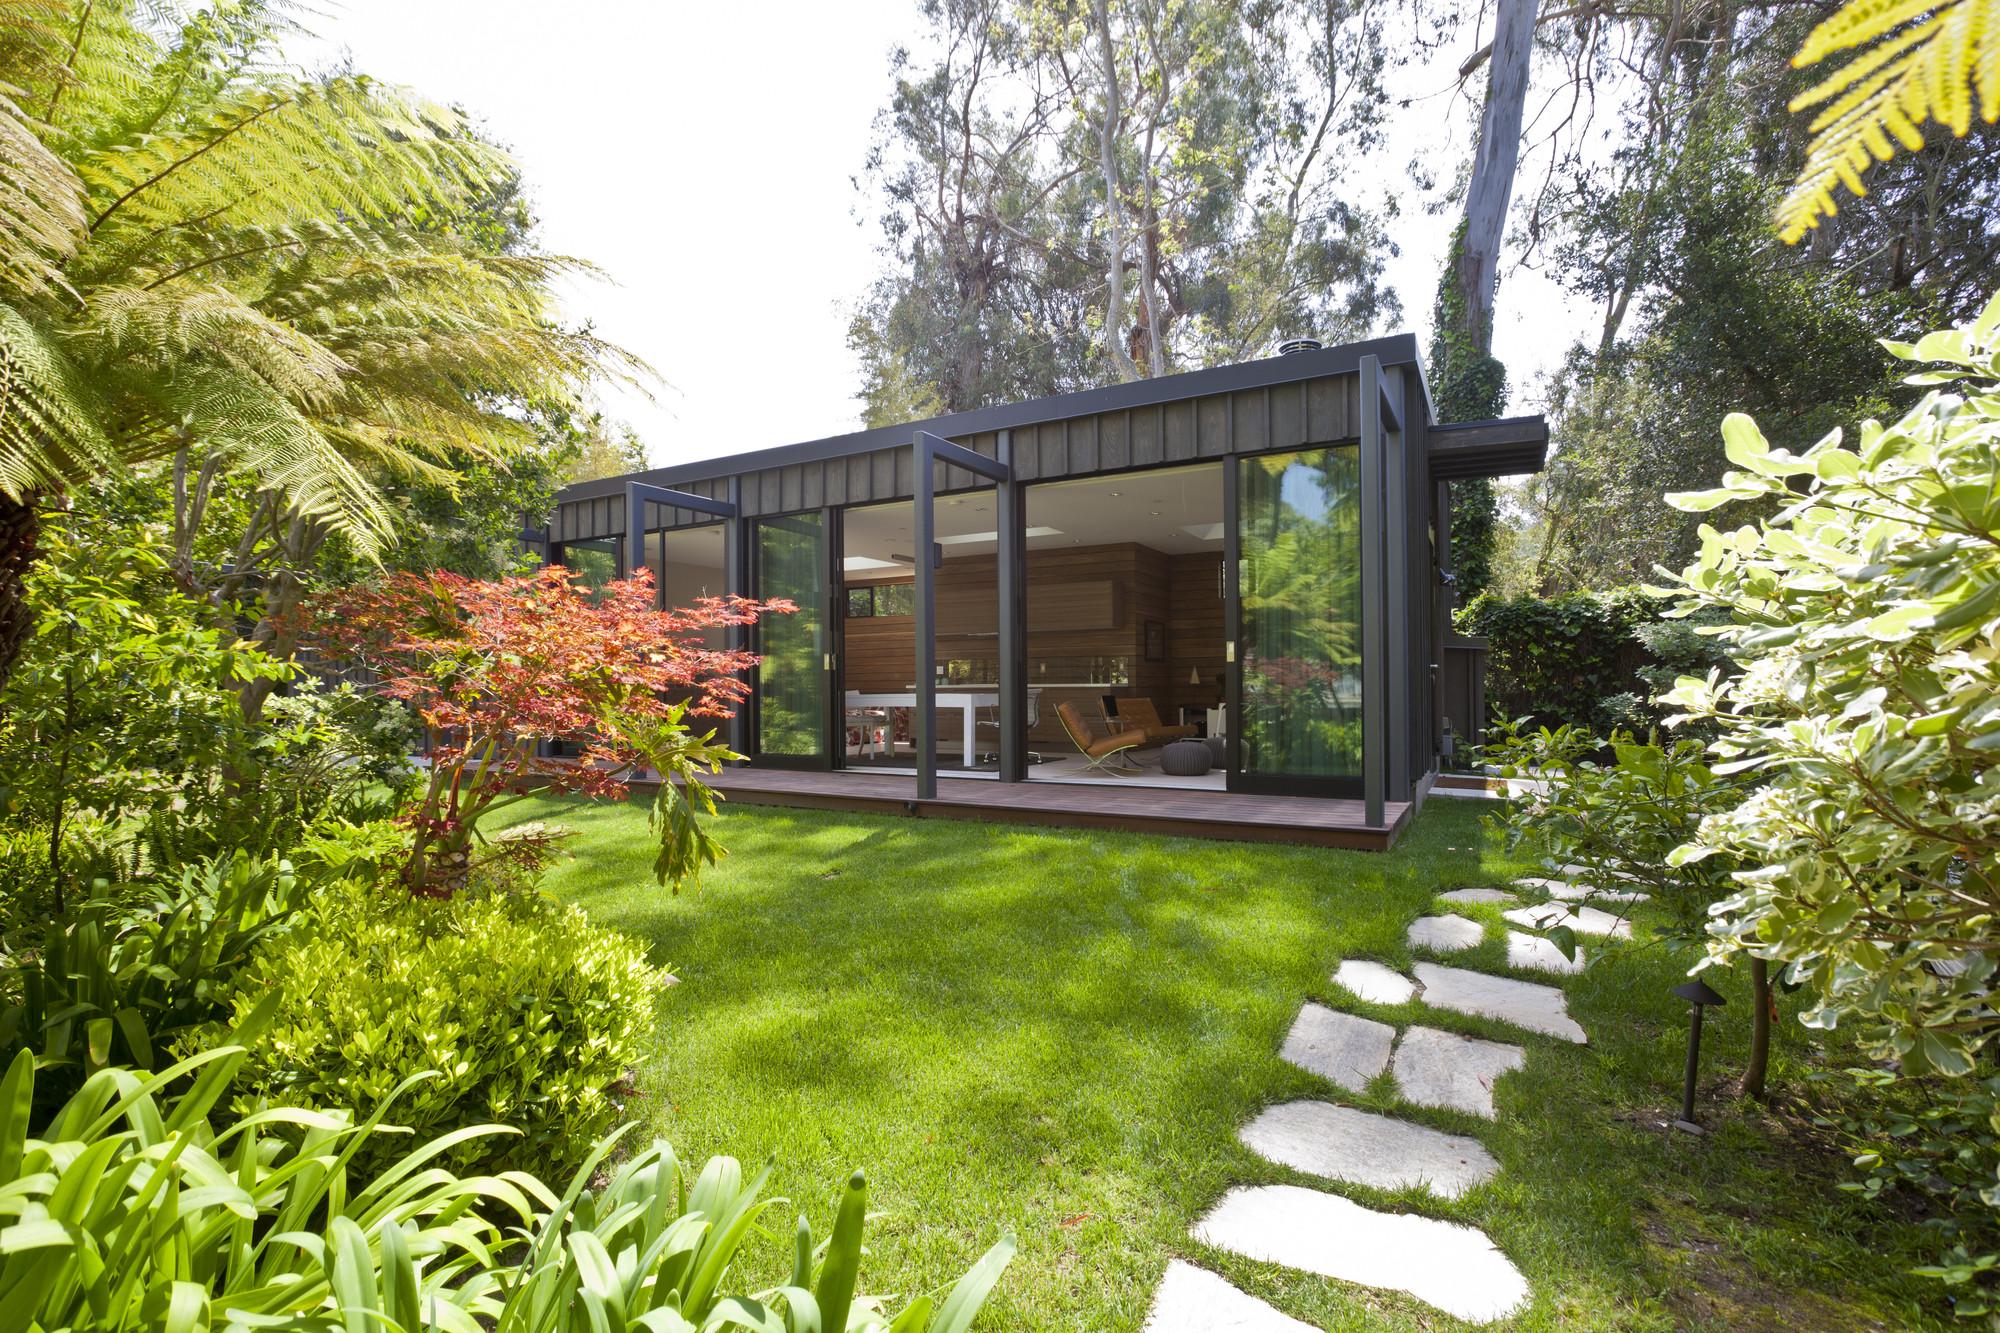 Residencia Santa Monica / Jendretzki, © Alejandro Wirth